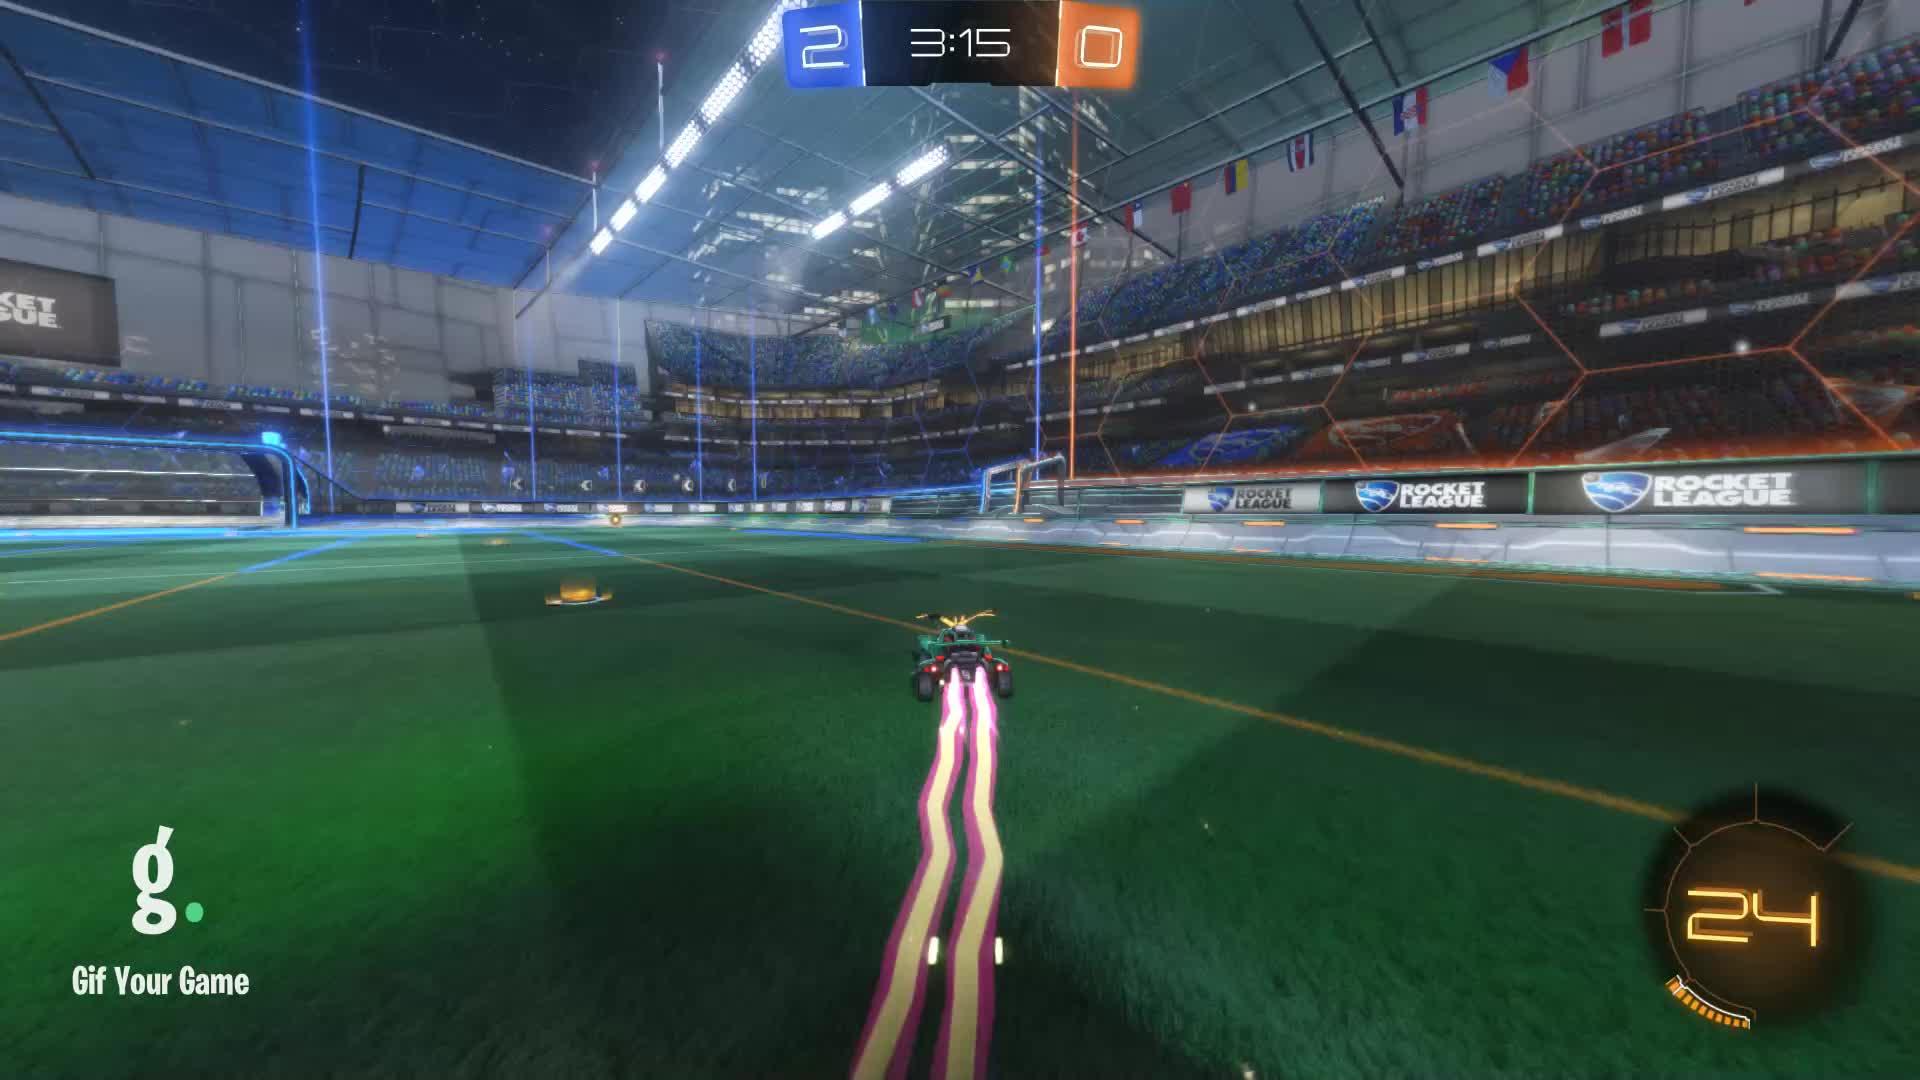 Gif Your Game, GifYourGame, Goal, Rocket League, RocketLeague, snus, Goal 3: Grand Champion actually GIFs